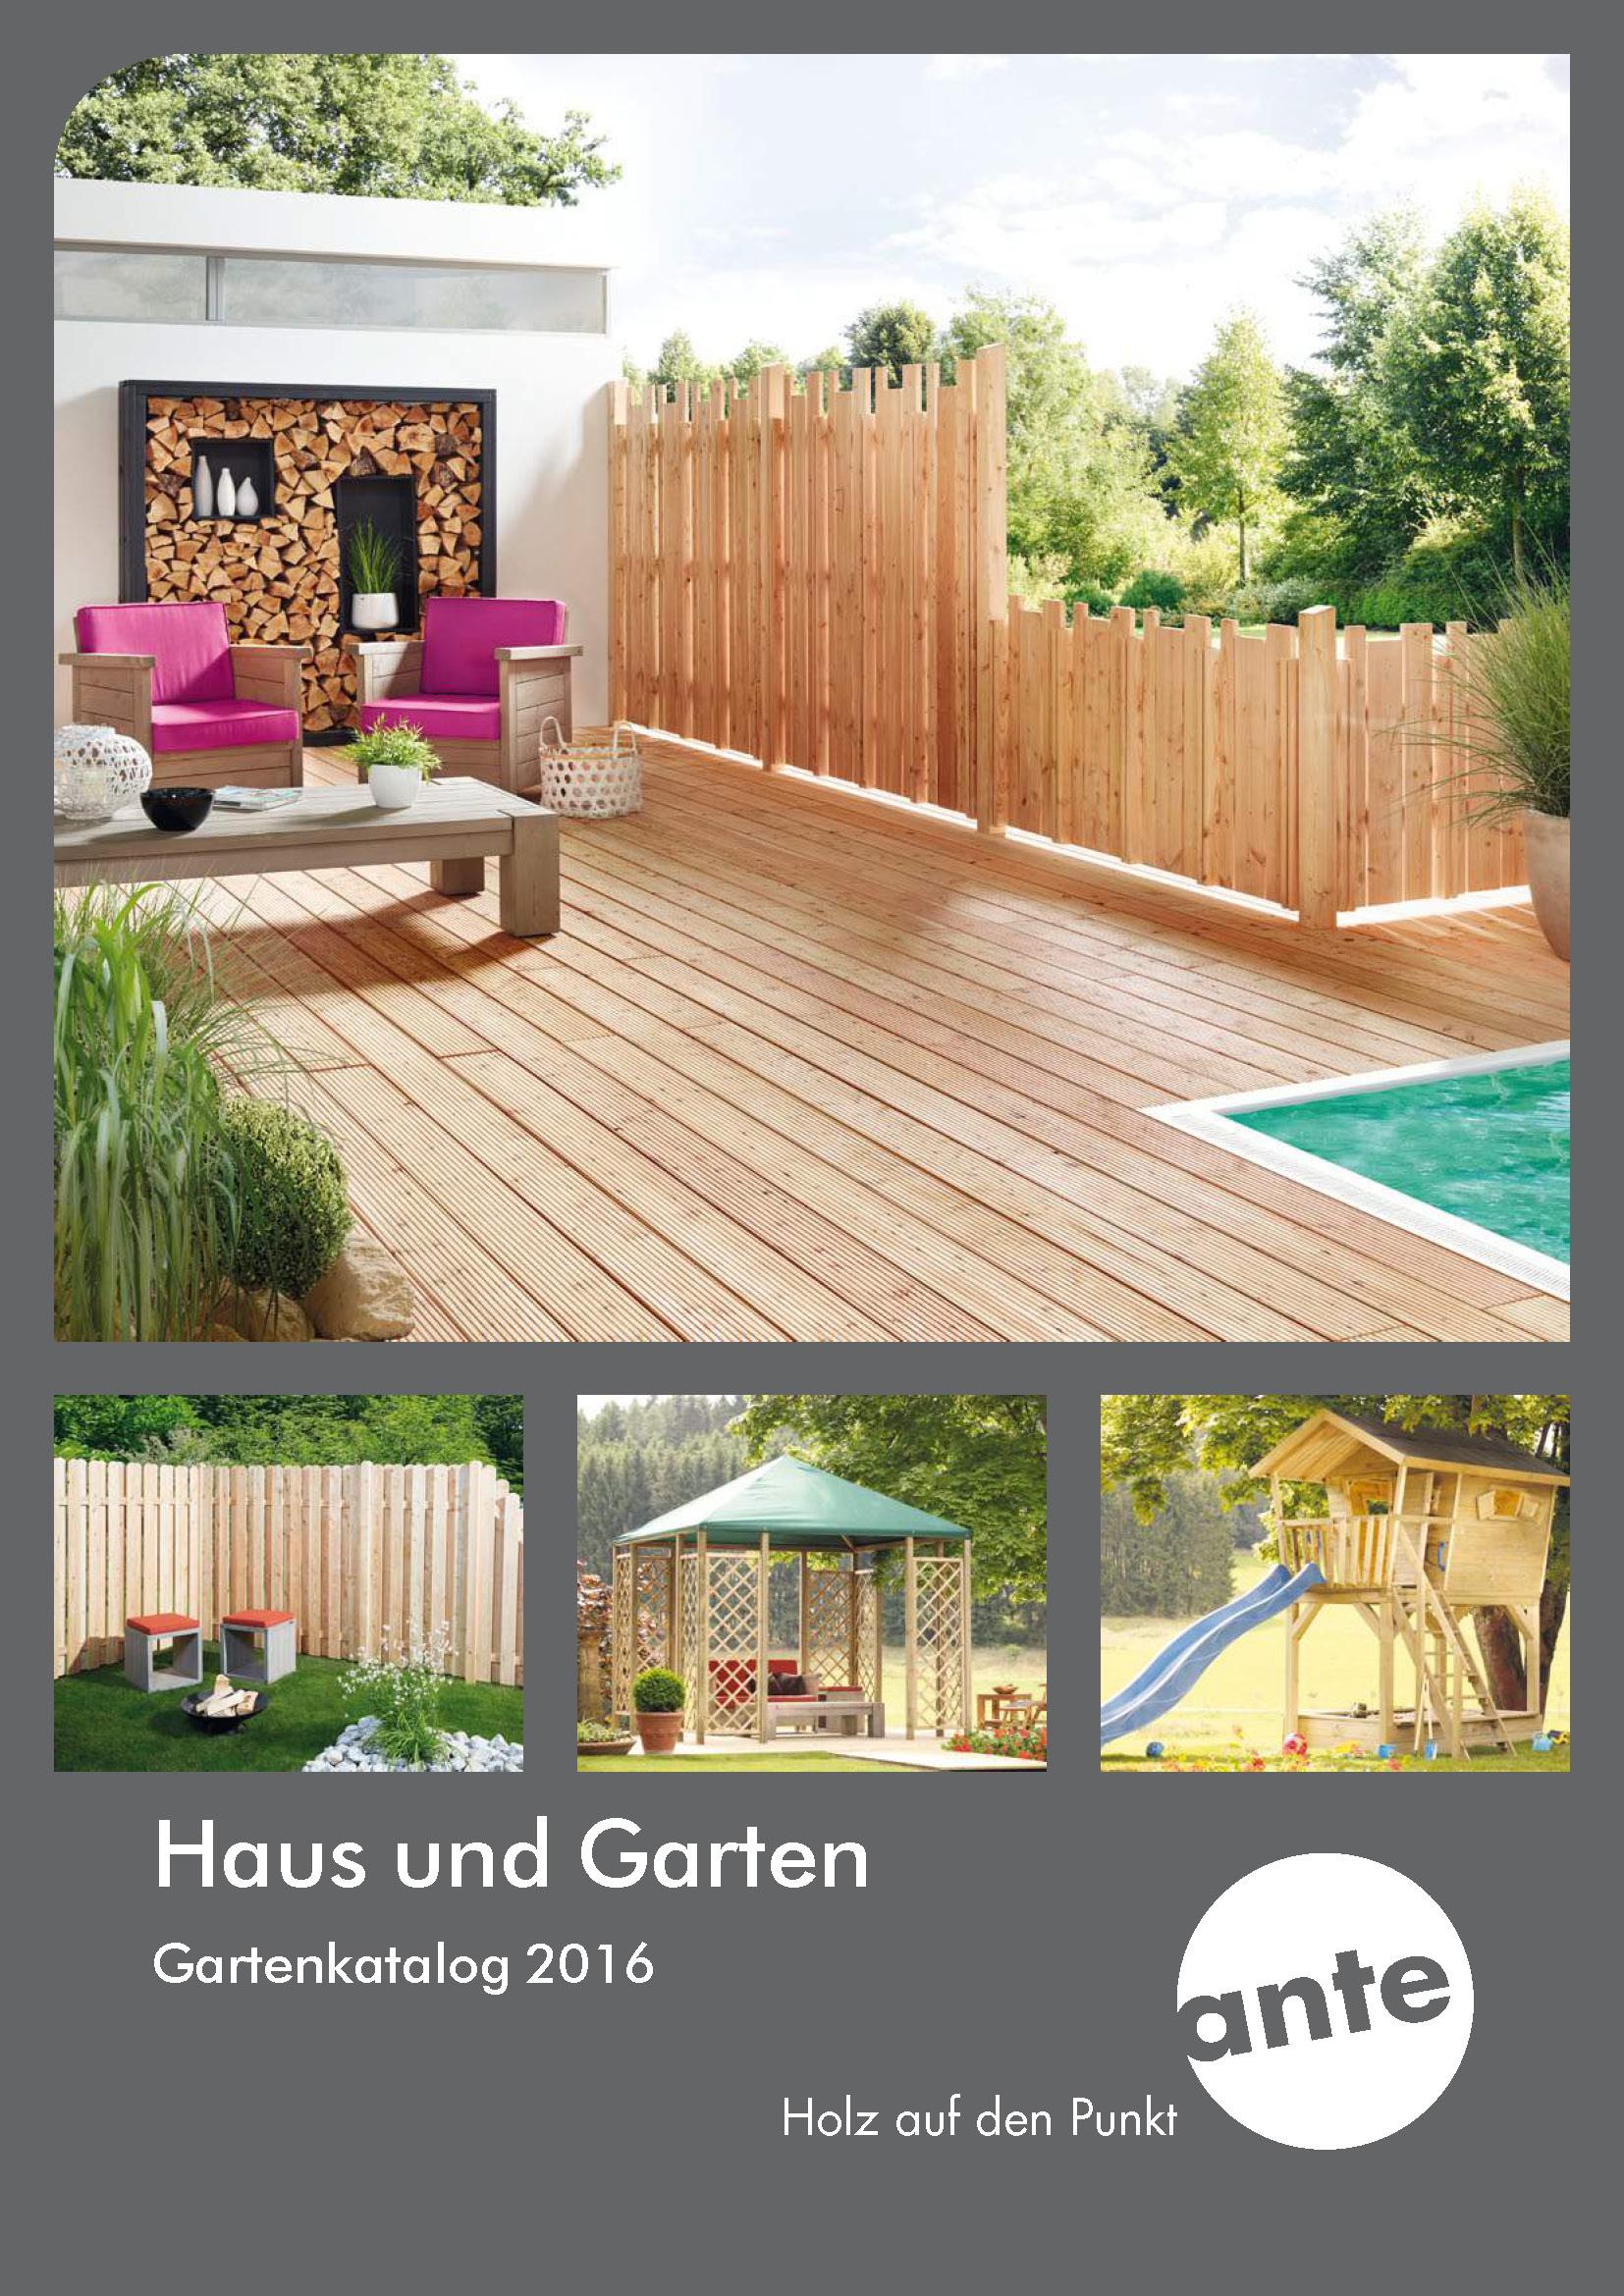 gartenhaus ger tehaus pavillon mainz bad kreuznach bingen. Black Bedroom Furniture Sets. Home Design Ideas